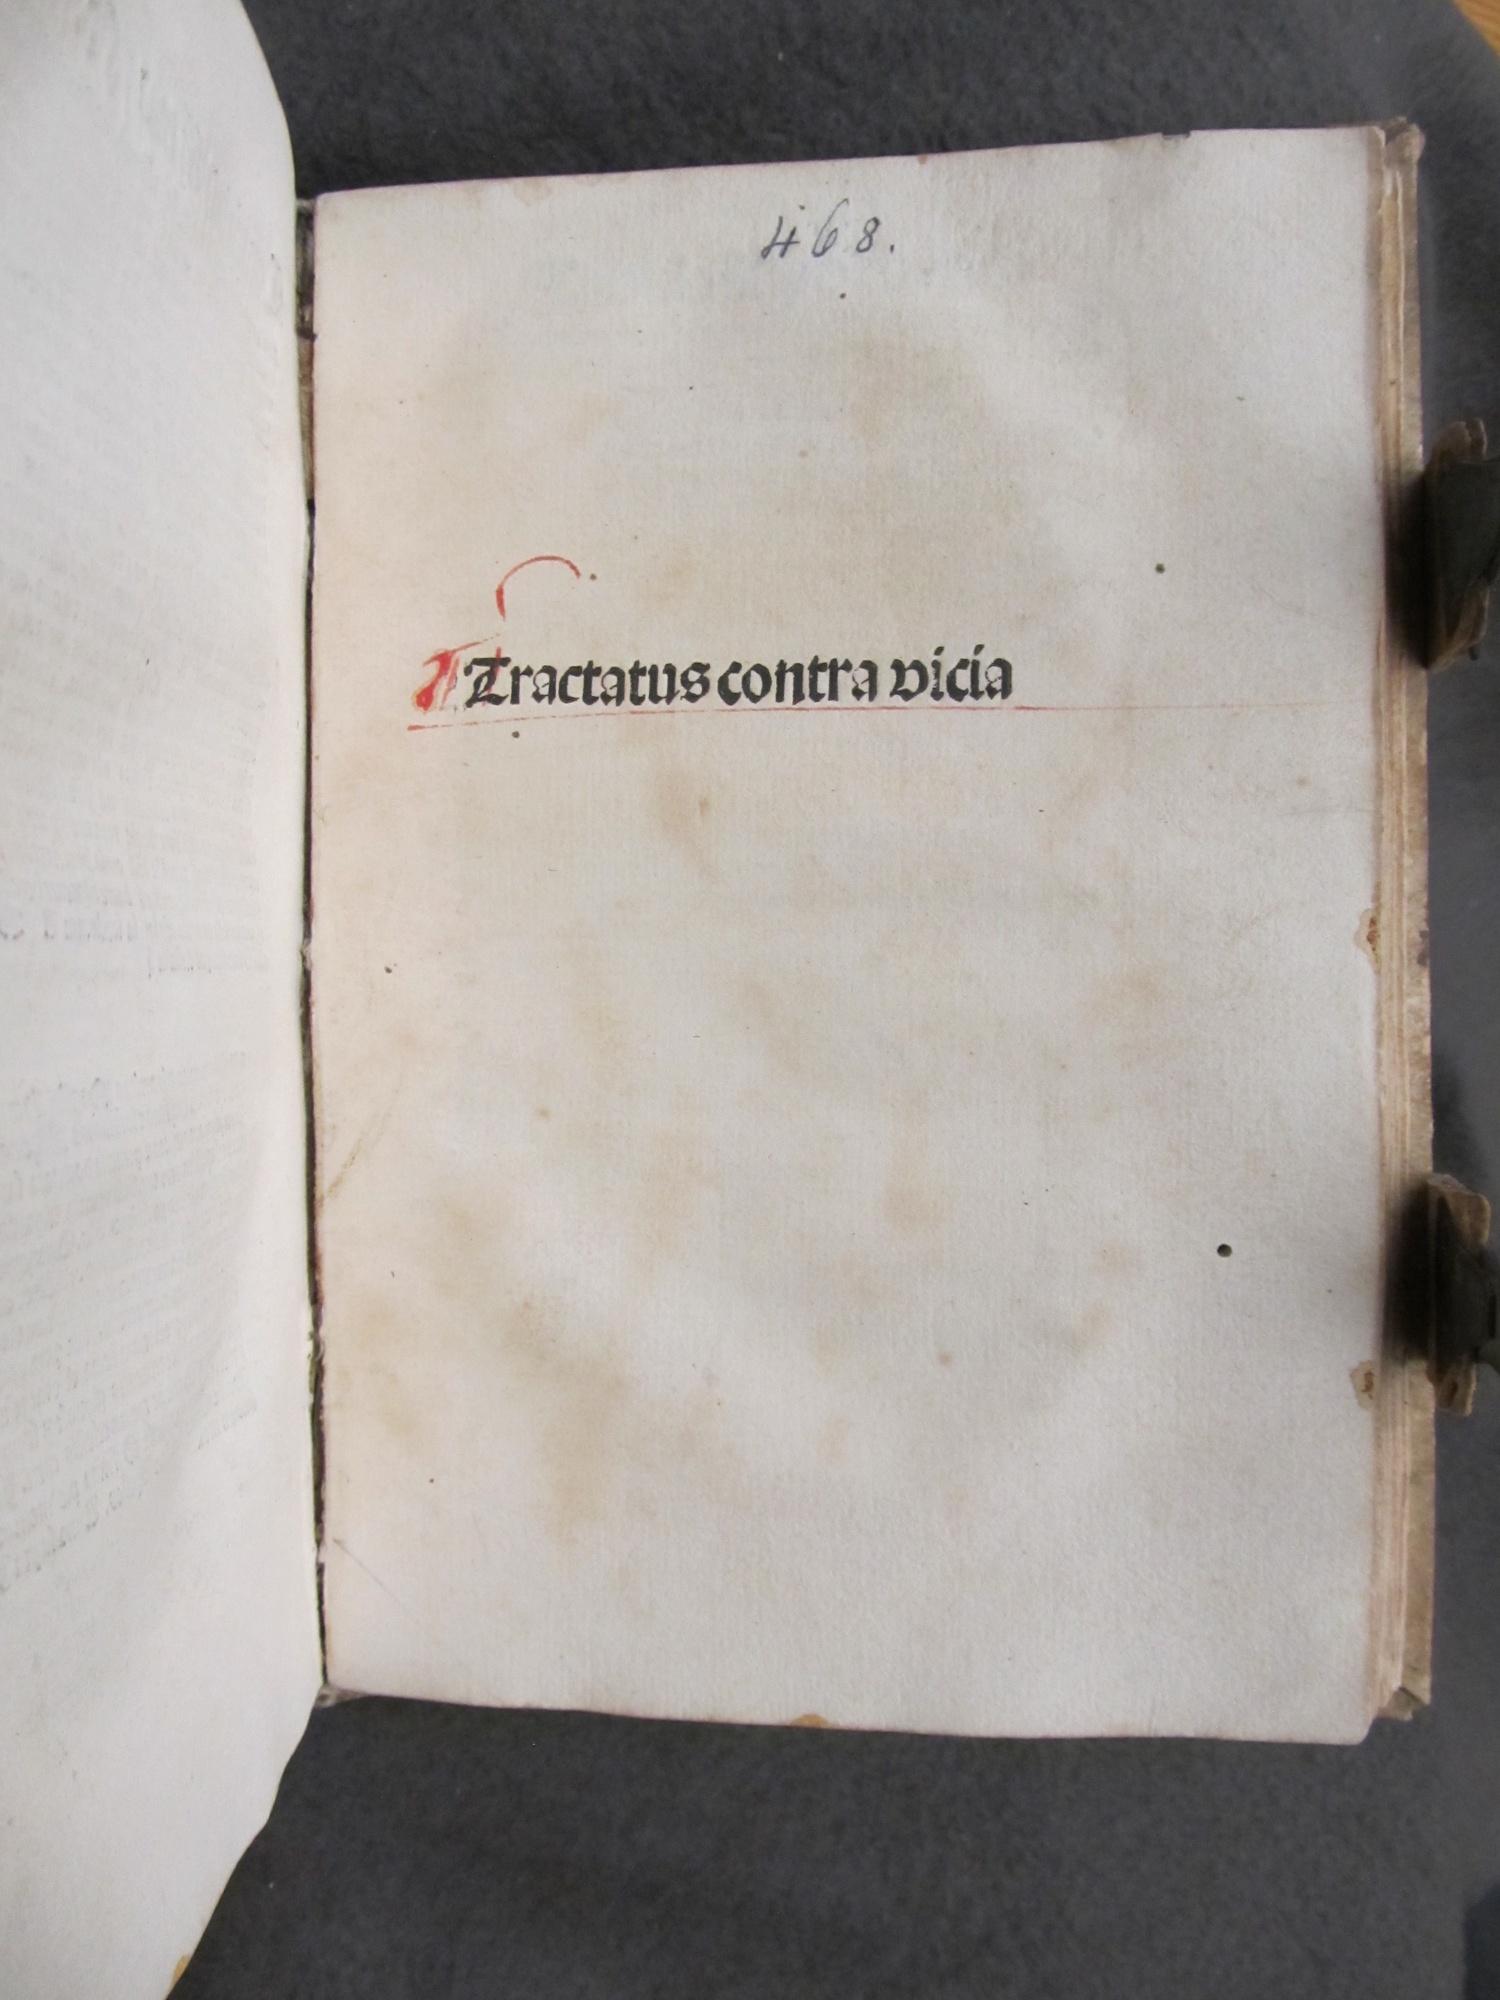 Tractatus contra vicia.